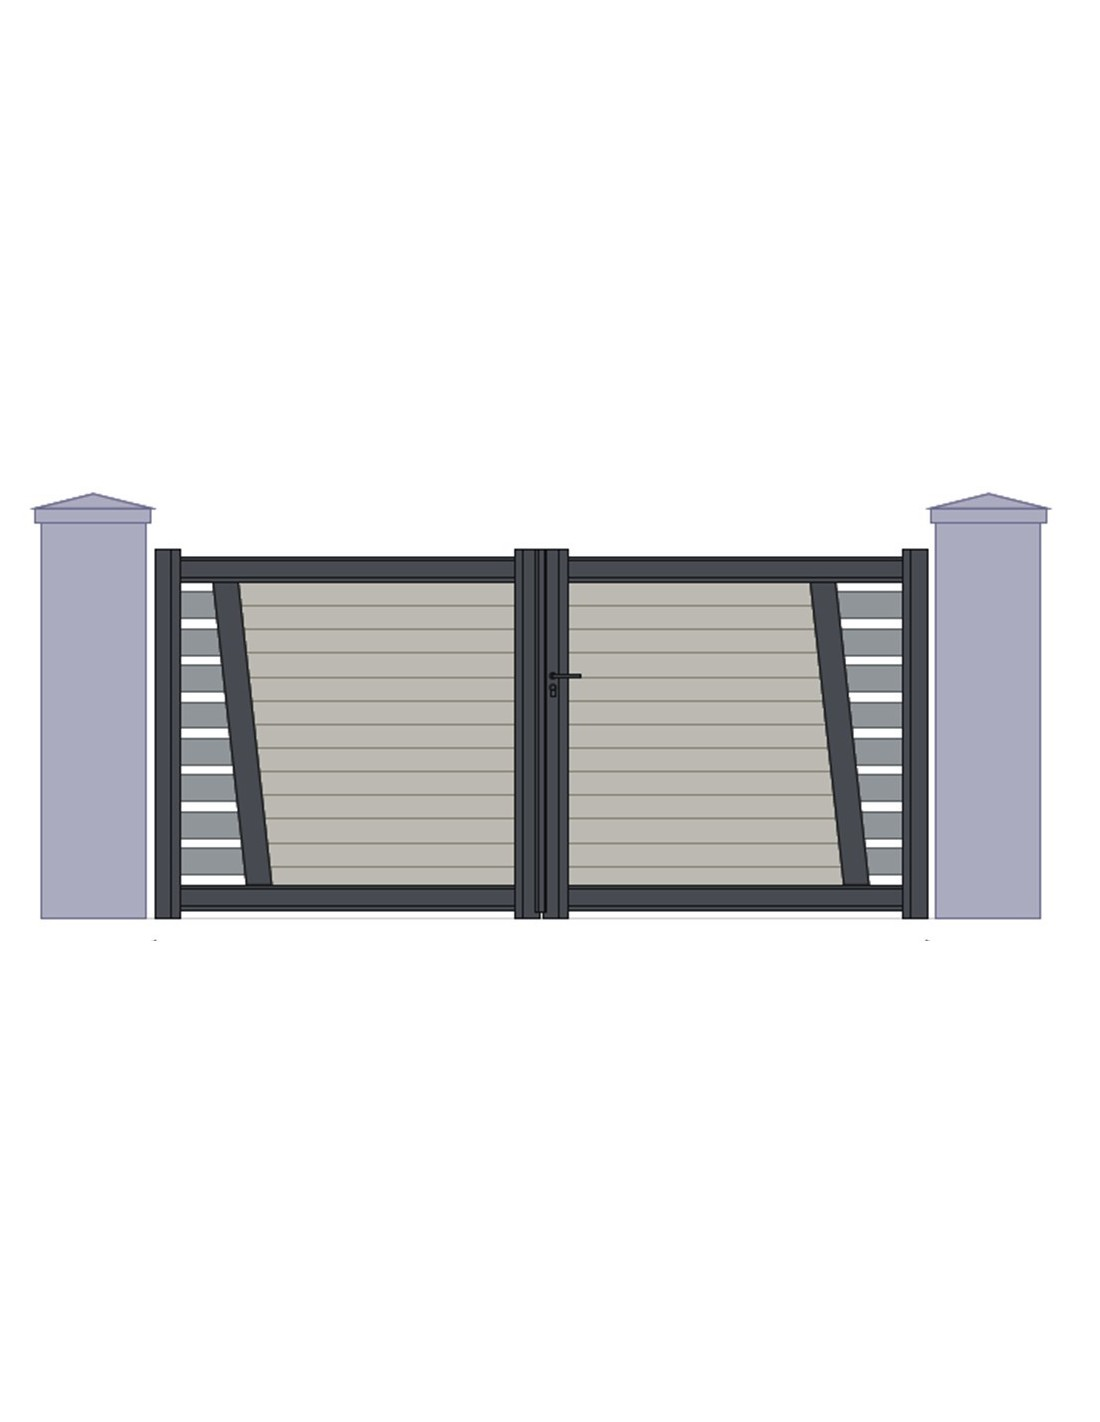 portail aluminium perigueux design contemporain sur mesure 3m50 4m 4m50 5m. Black Bedroom Furniture Sets. Home Design Ideas